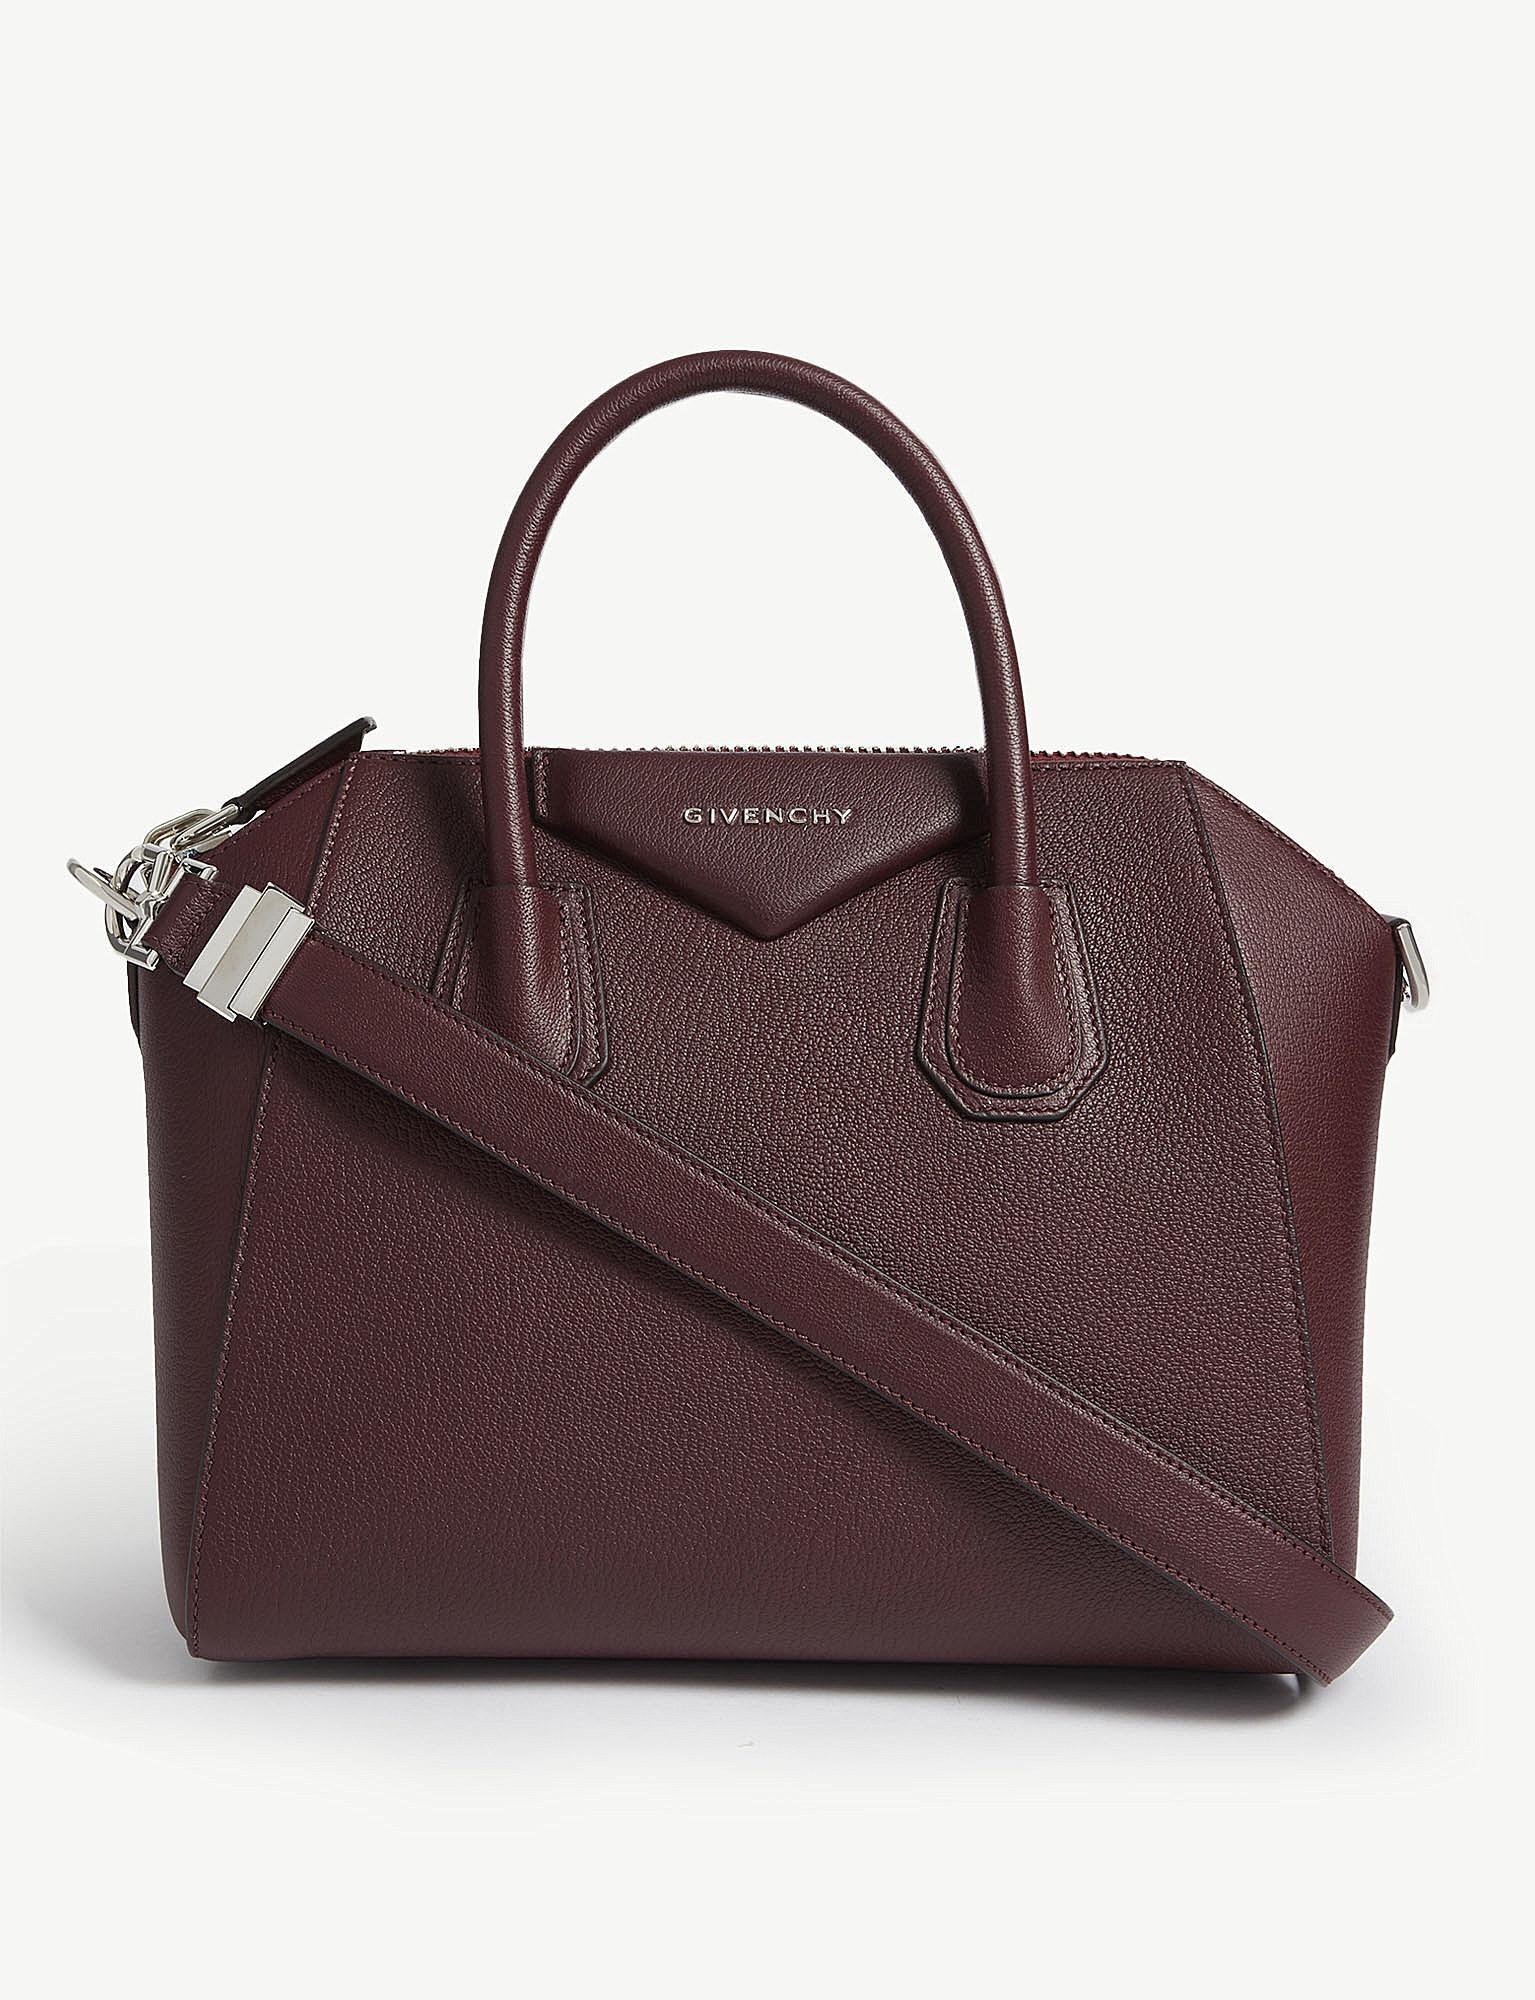 3360390b551 Givenchy - Multicolor Antigona Small Leather Shoulder Bag - Lyst. View  fullscreen